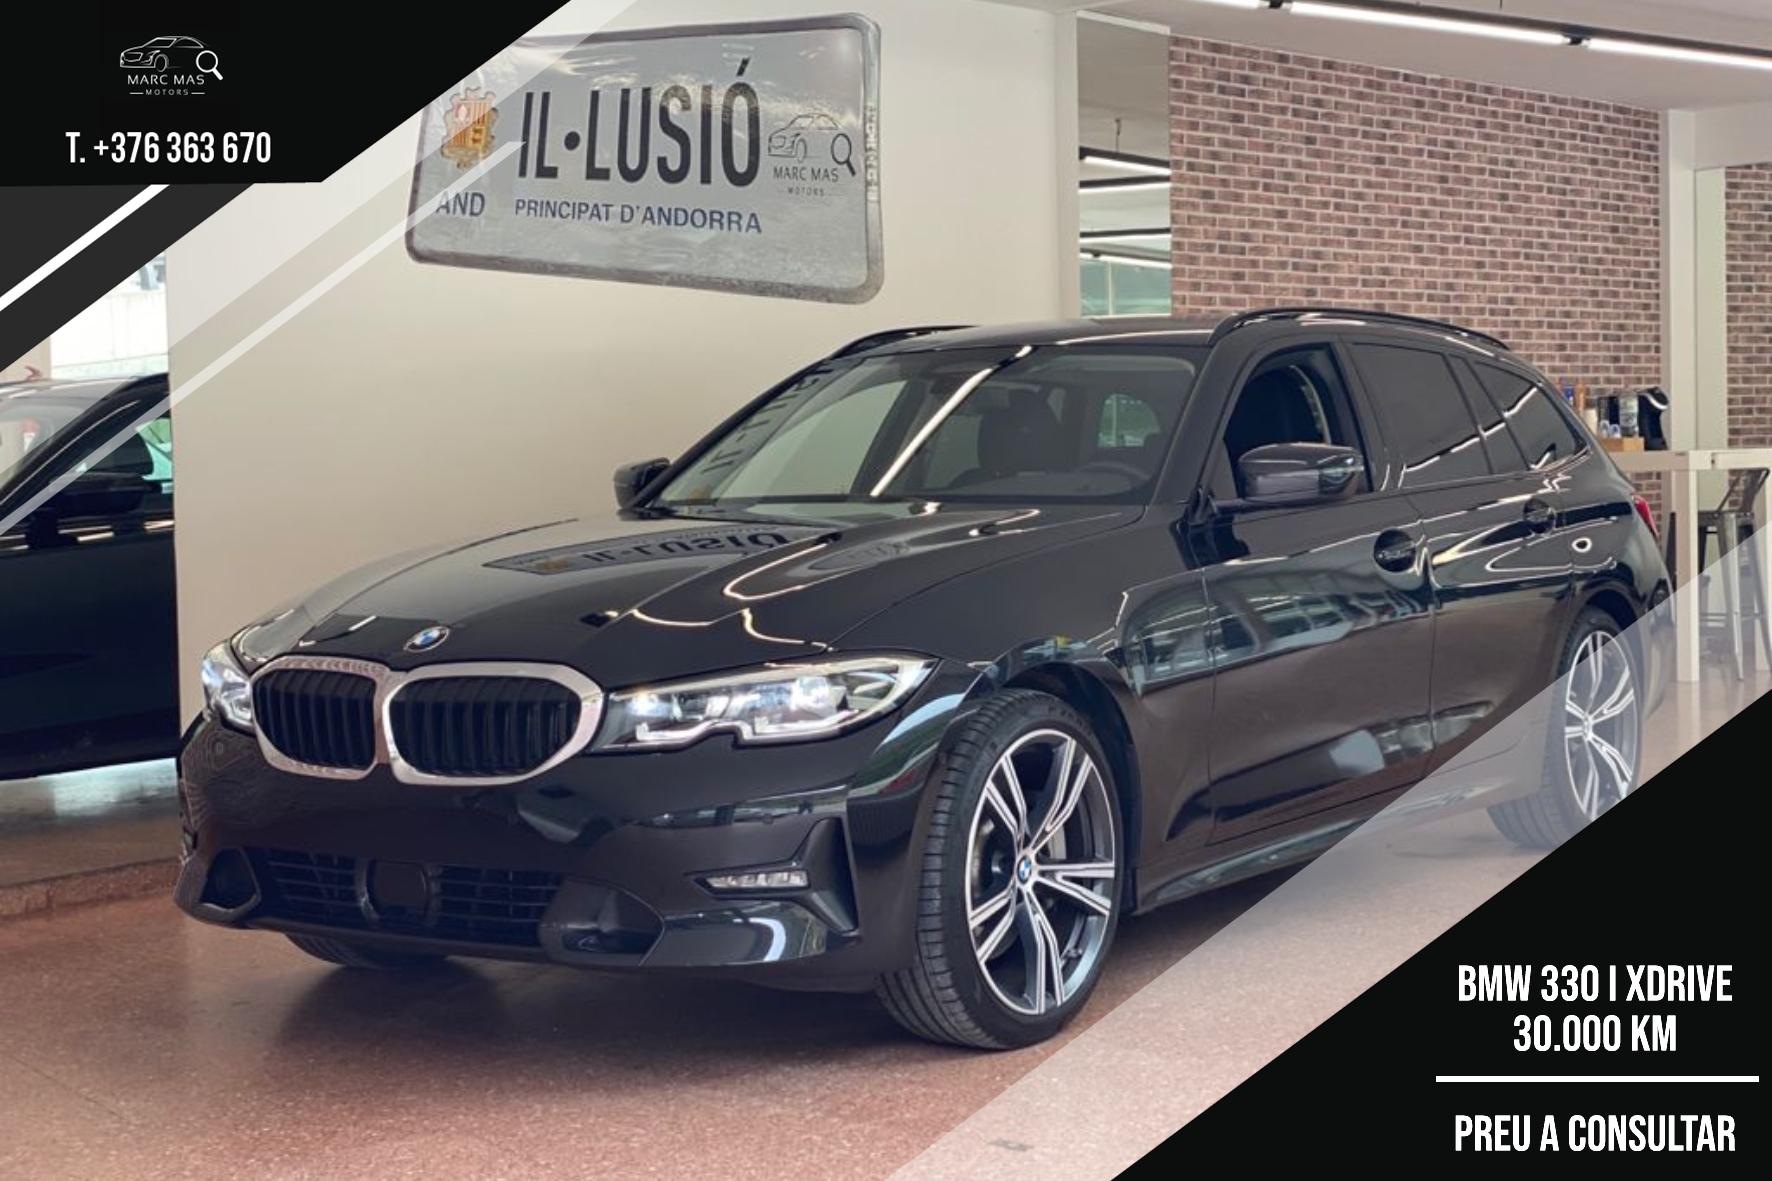 BMW - 330 i XDRIVE  - 330 I XDRIVE   A Consultar